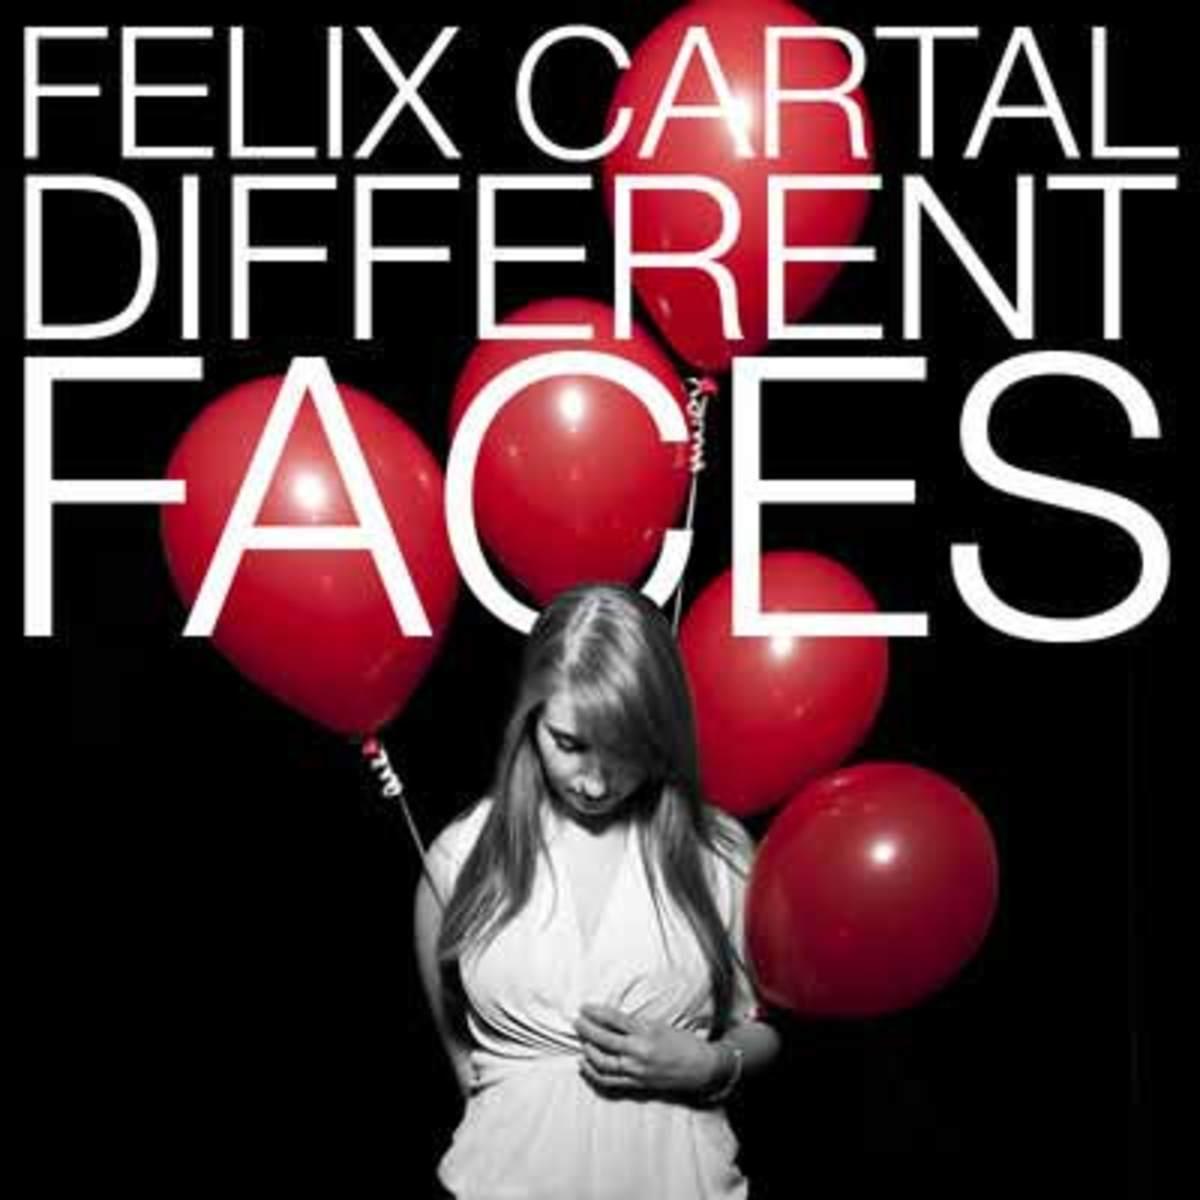 felix.cartal.different.faces